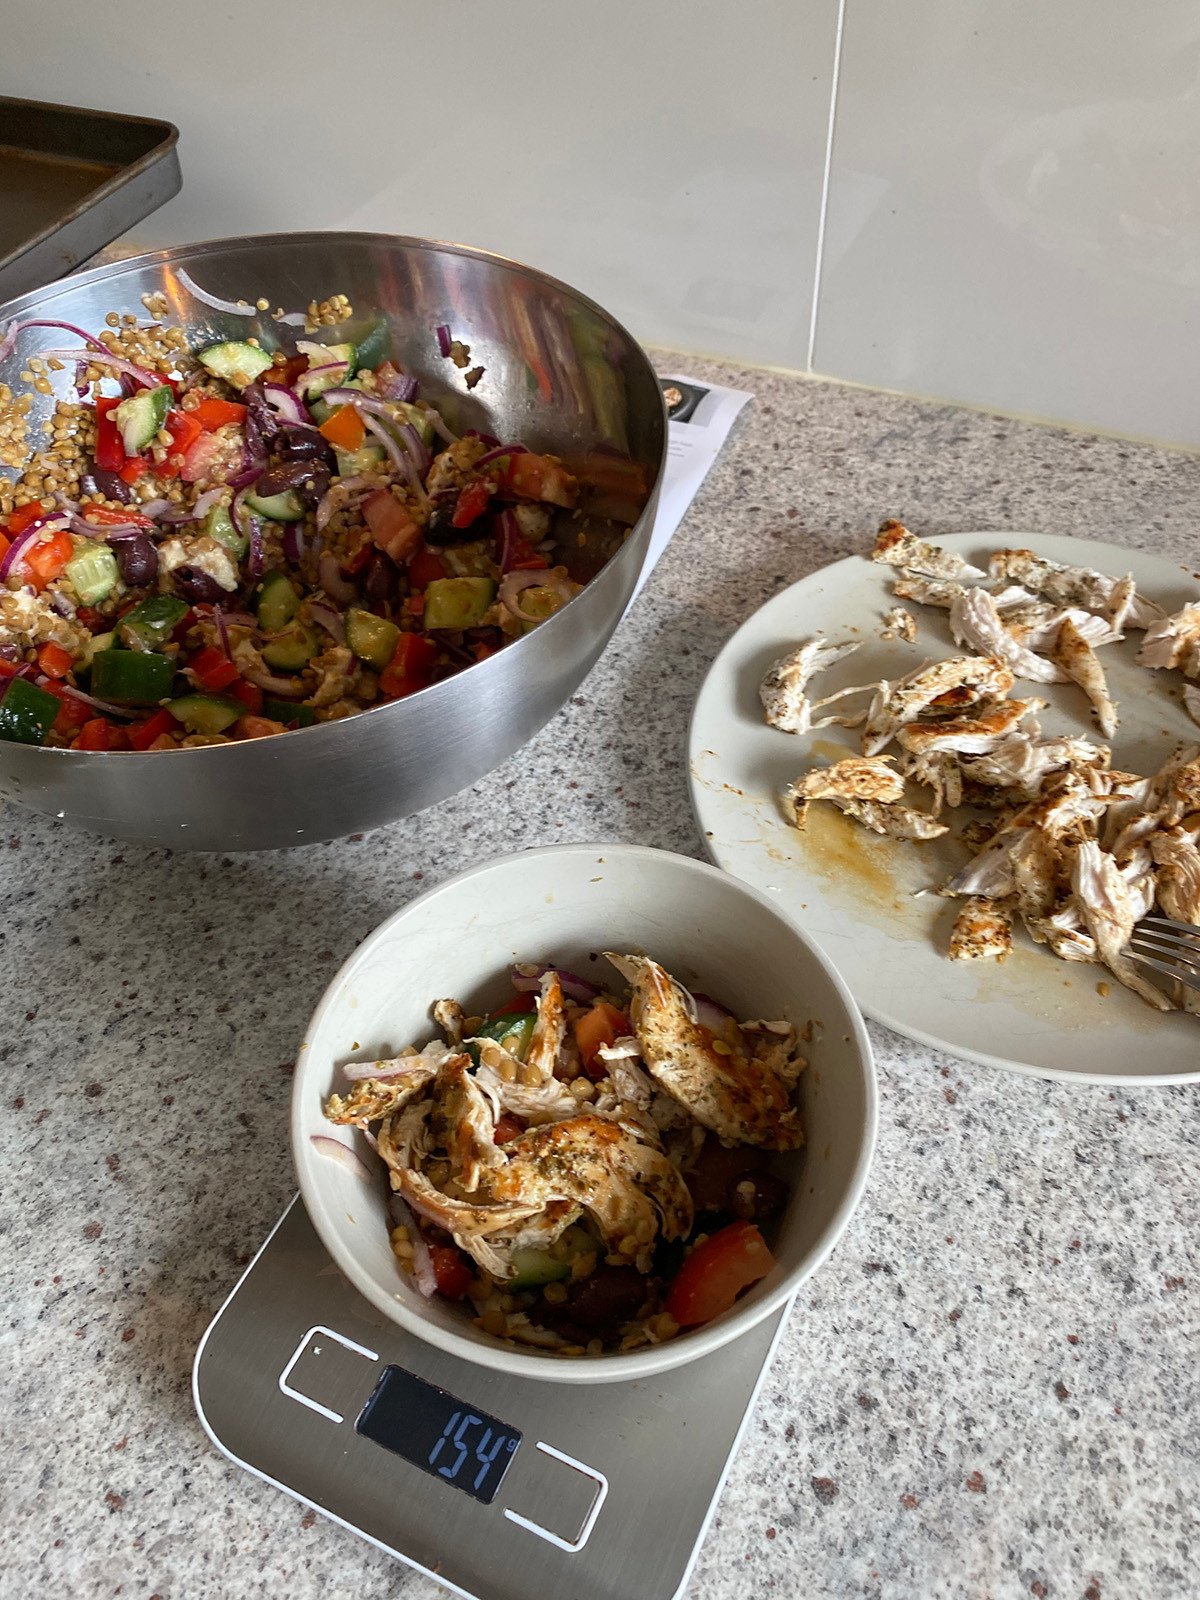 Portioning Marley Spoon's Chicken Lentil